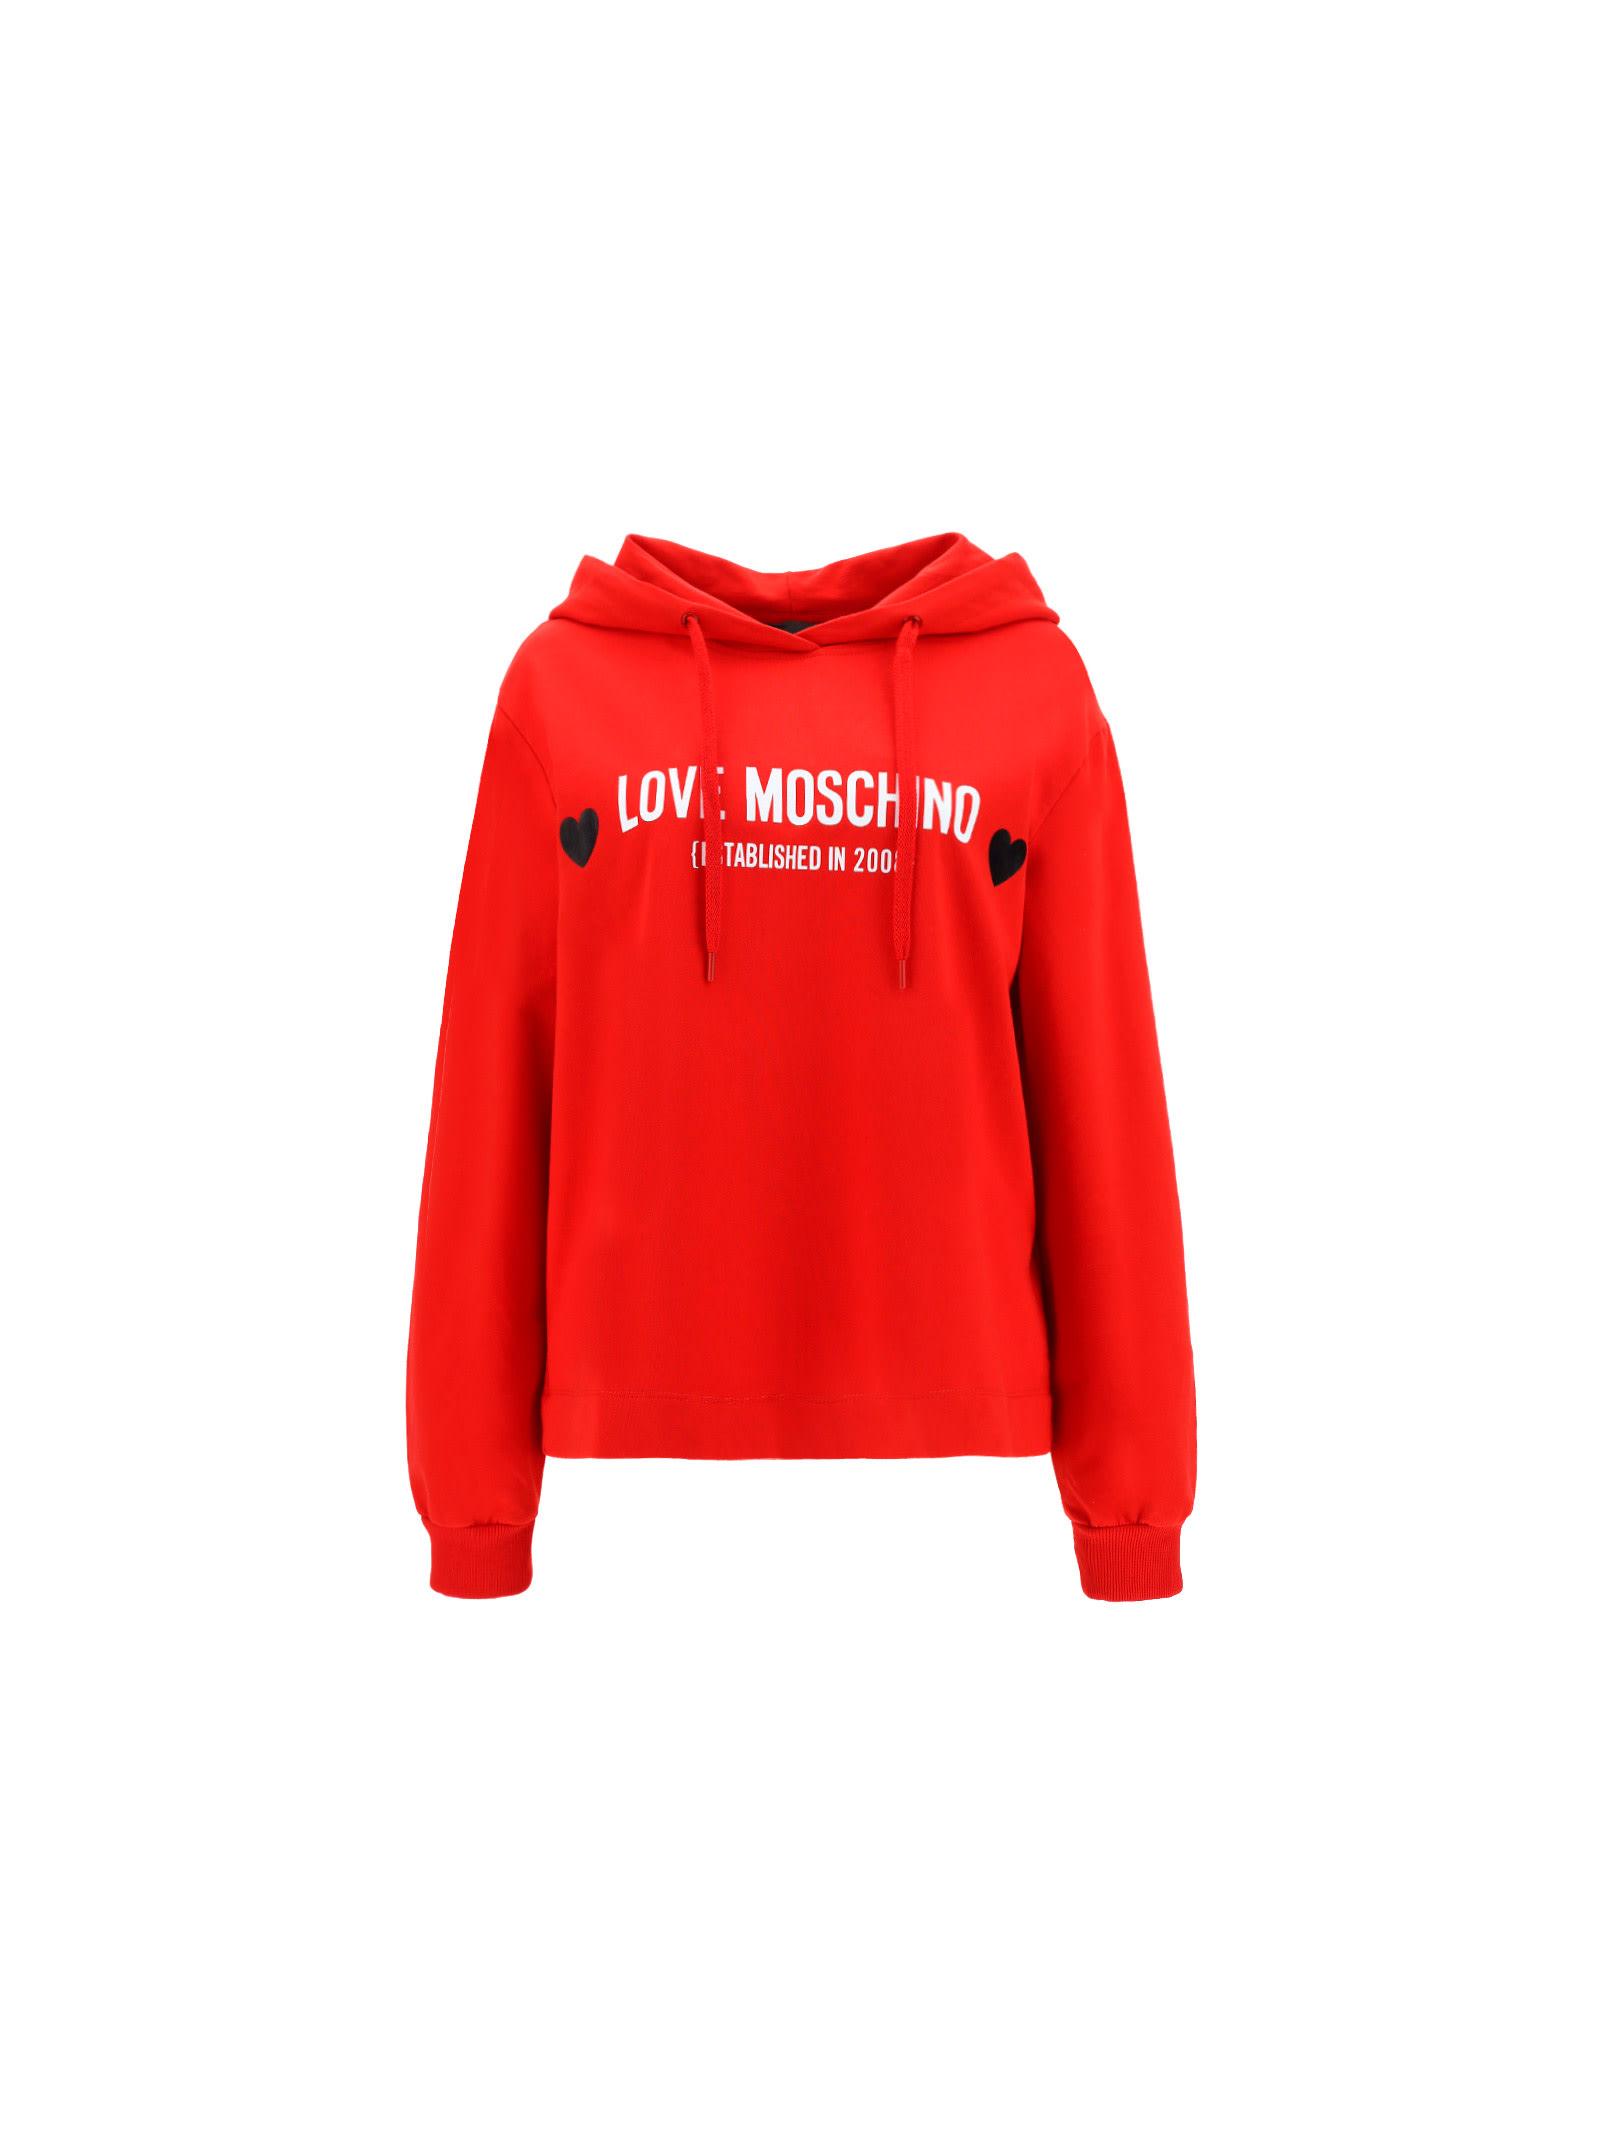 Love Moschino Hoodies HOODIE